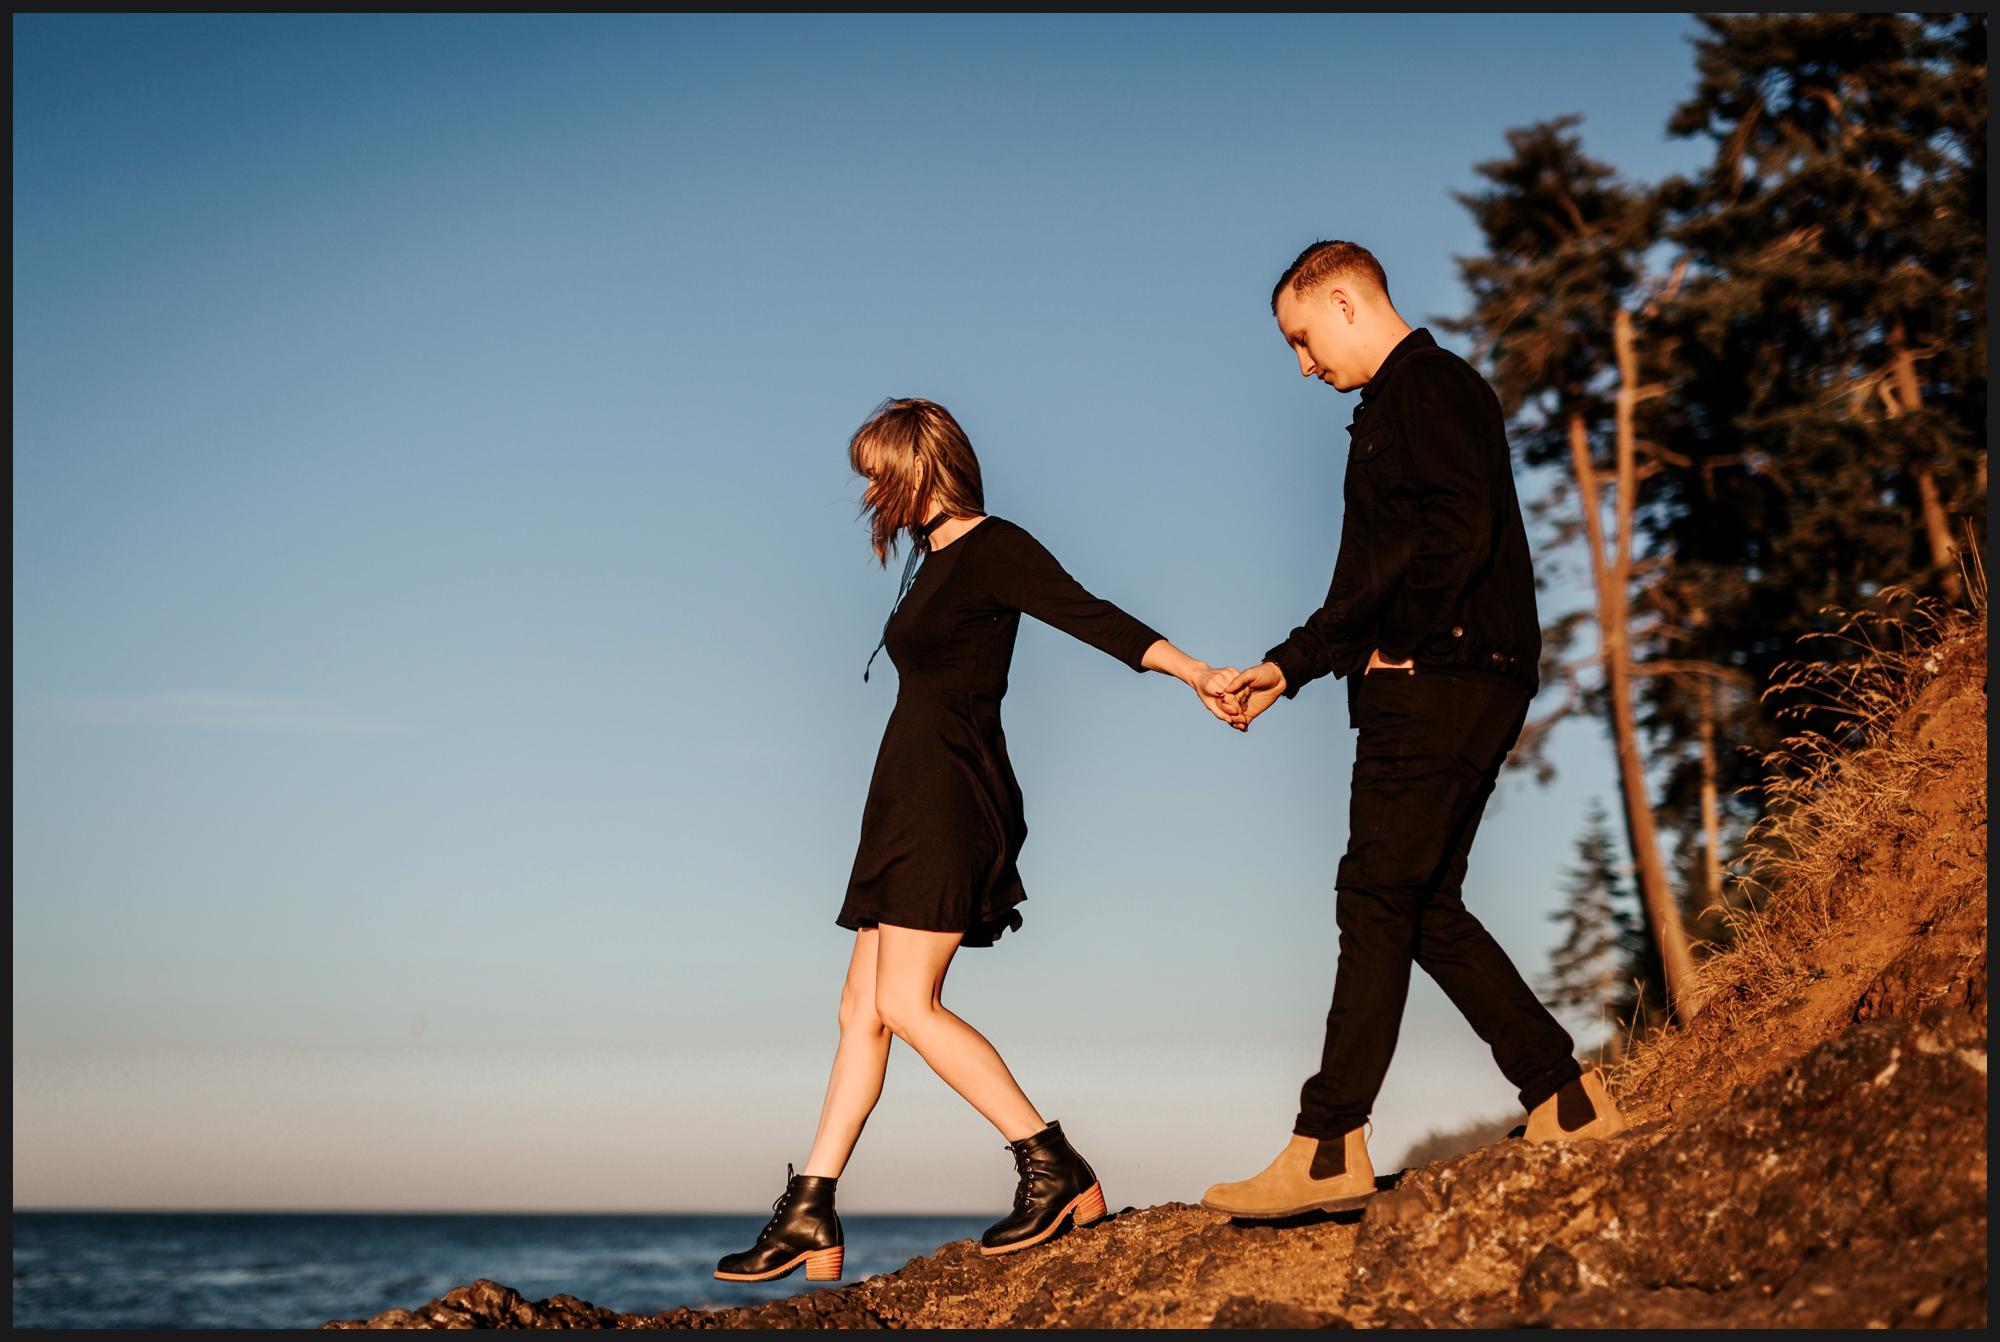 Orlando-Wedding-Photographer-destination-wedding-photographer-florida-wedding-photographer-bohemian-wedding-photographer_0258.jpg